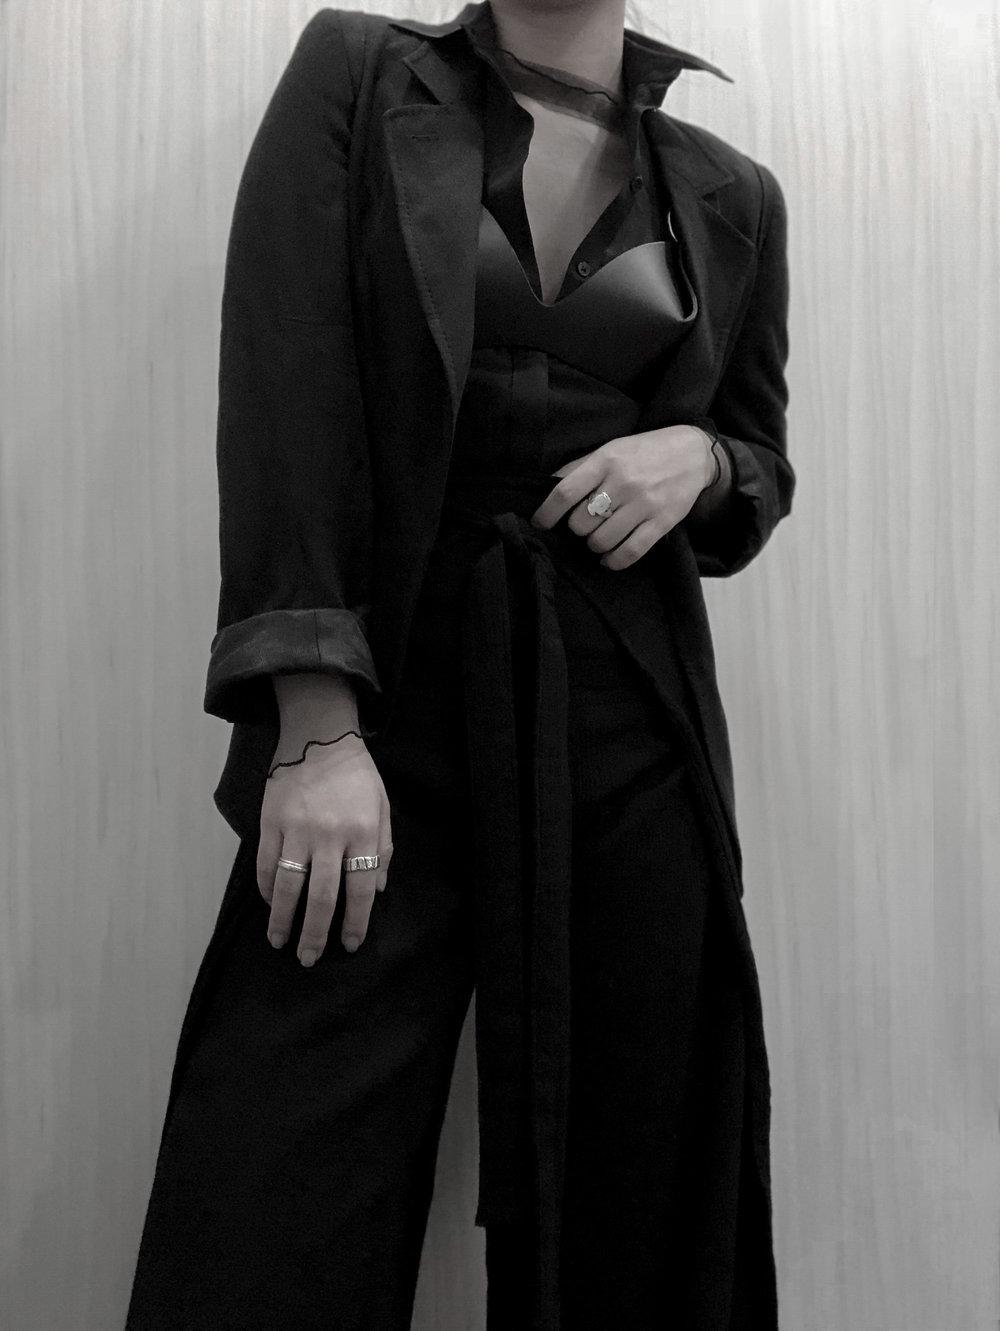 | Fleet Ilya   O-Ring Cross Back Bra   | Ann Demeulemeester  Blazer/Suede Jacket  | Calvin Klein  Shirt  | Sisters of the Black Moon   Rogalin Pants